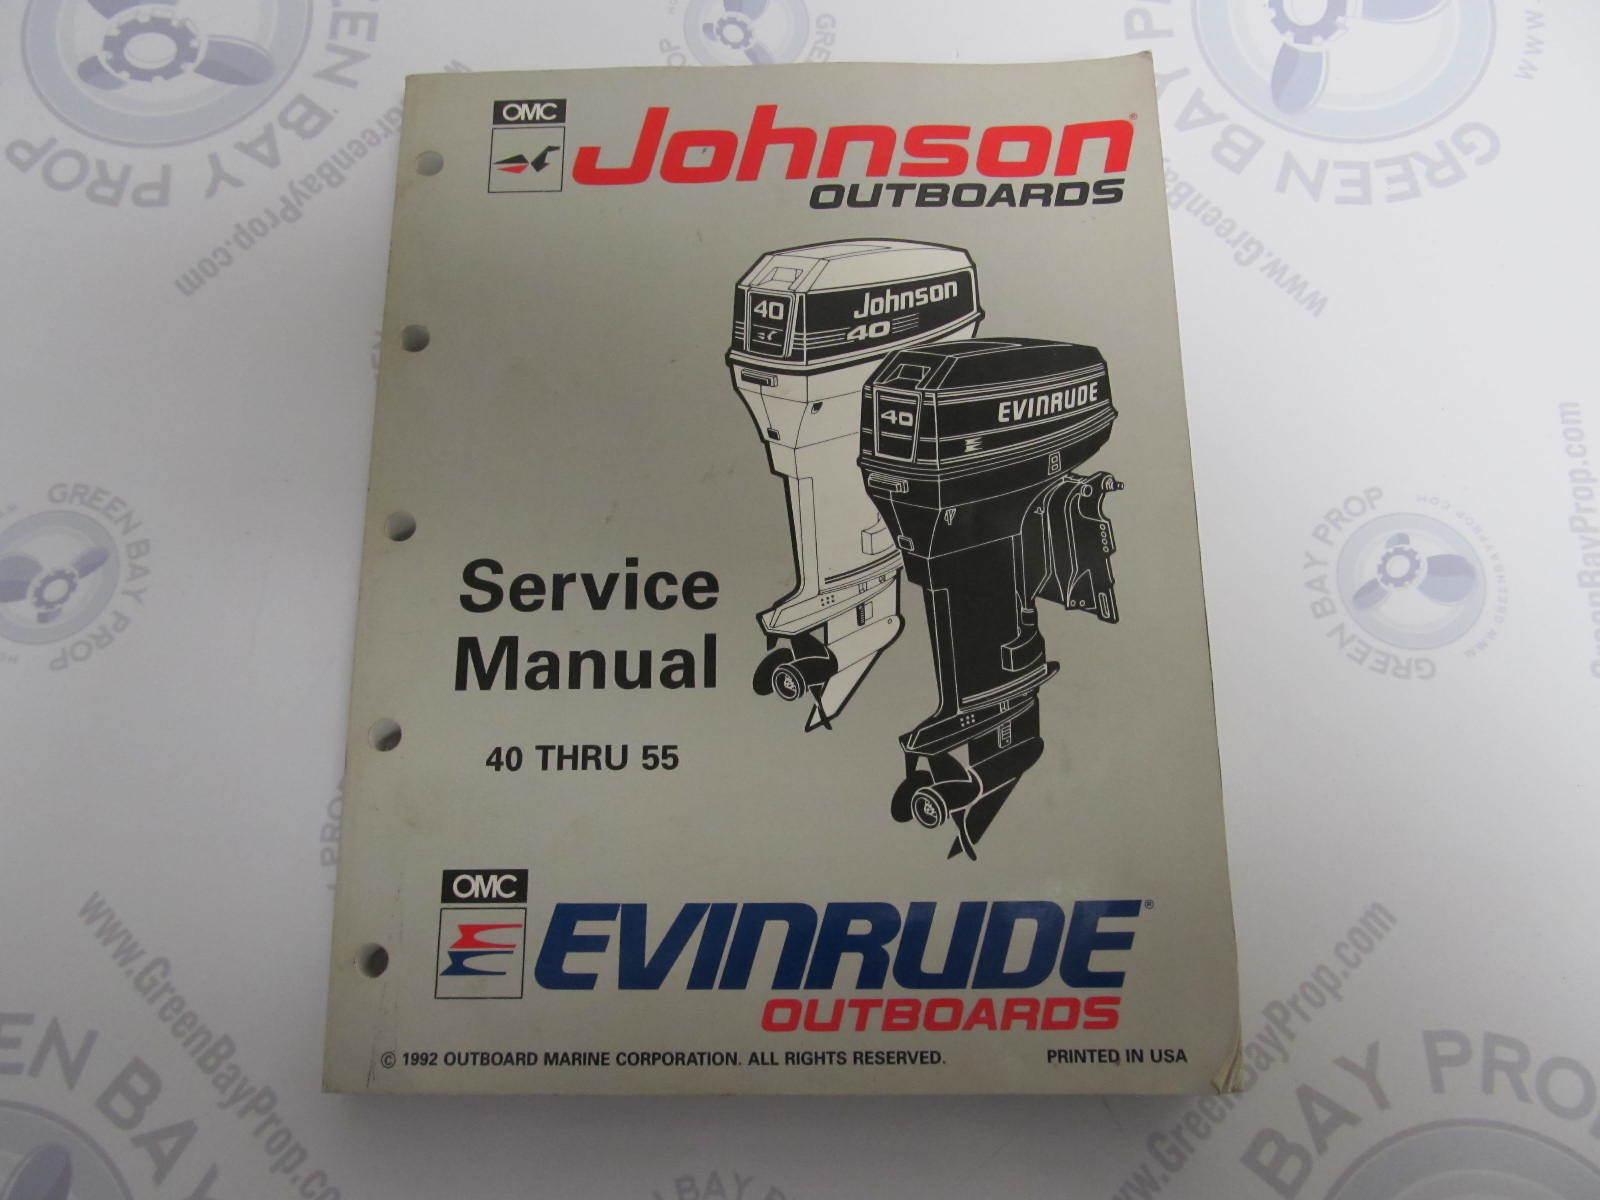 Evinrude manual